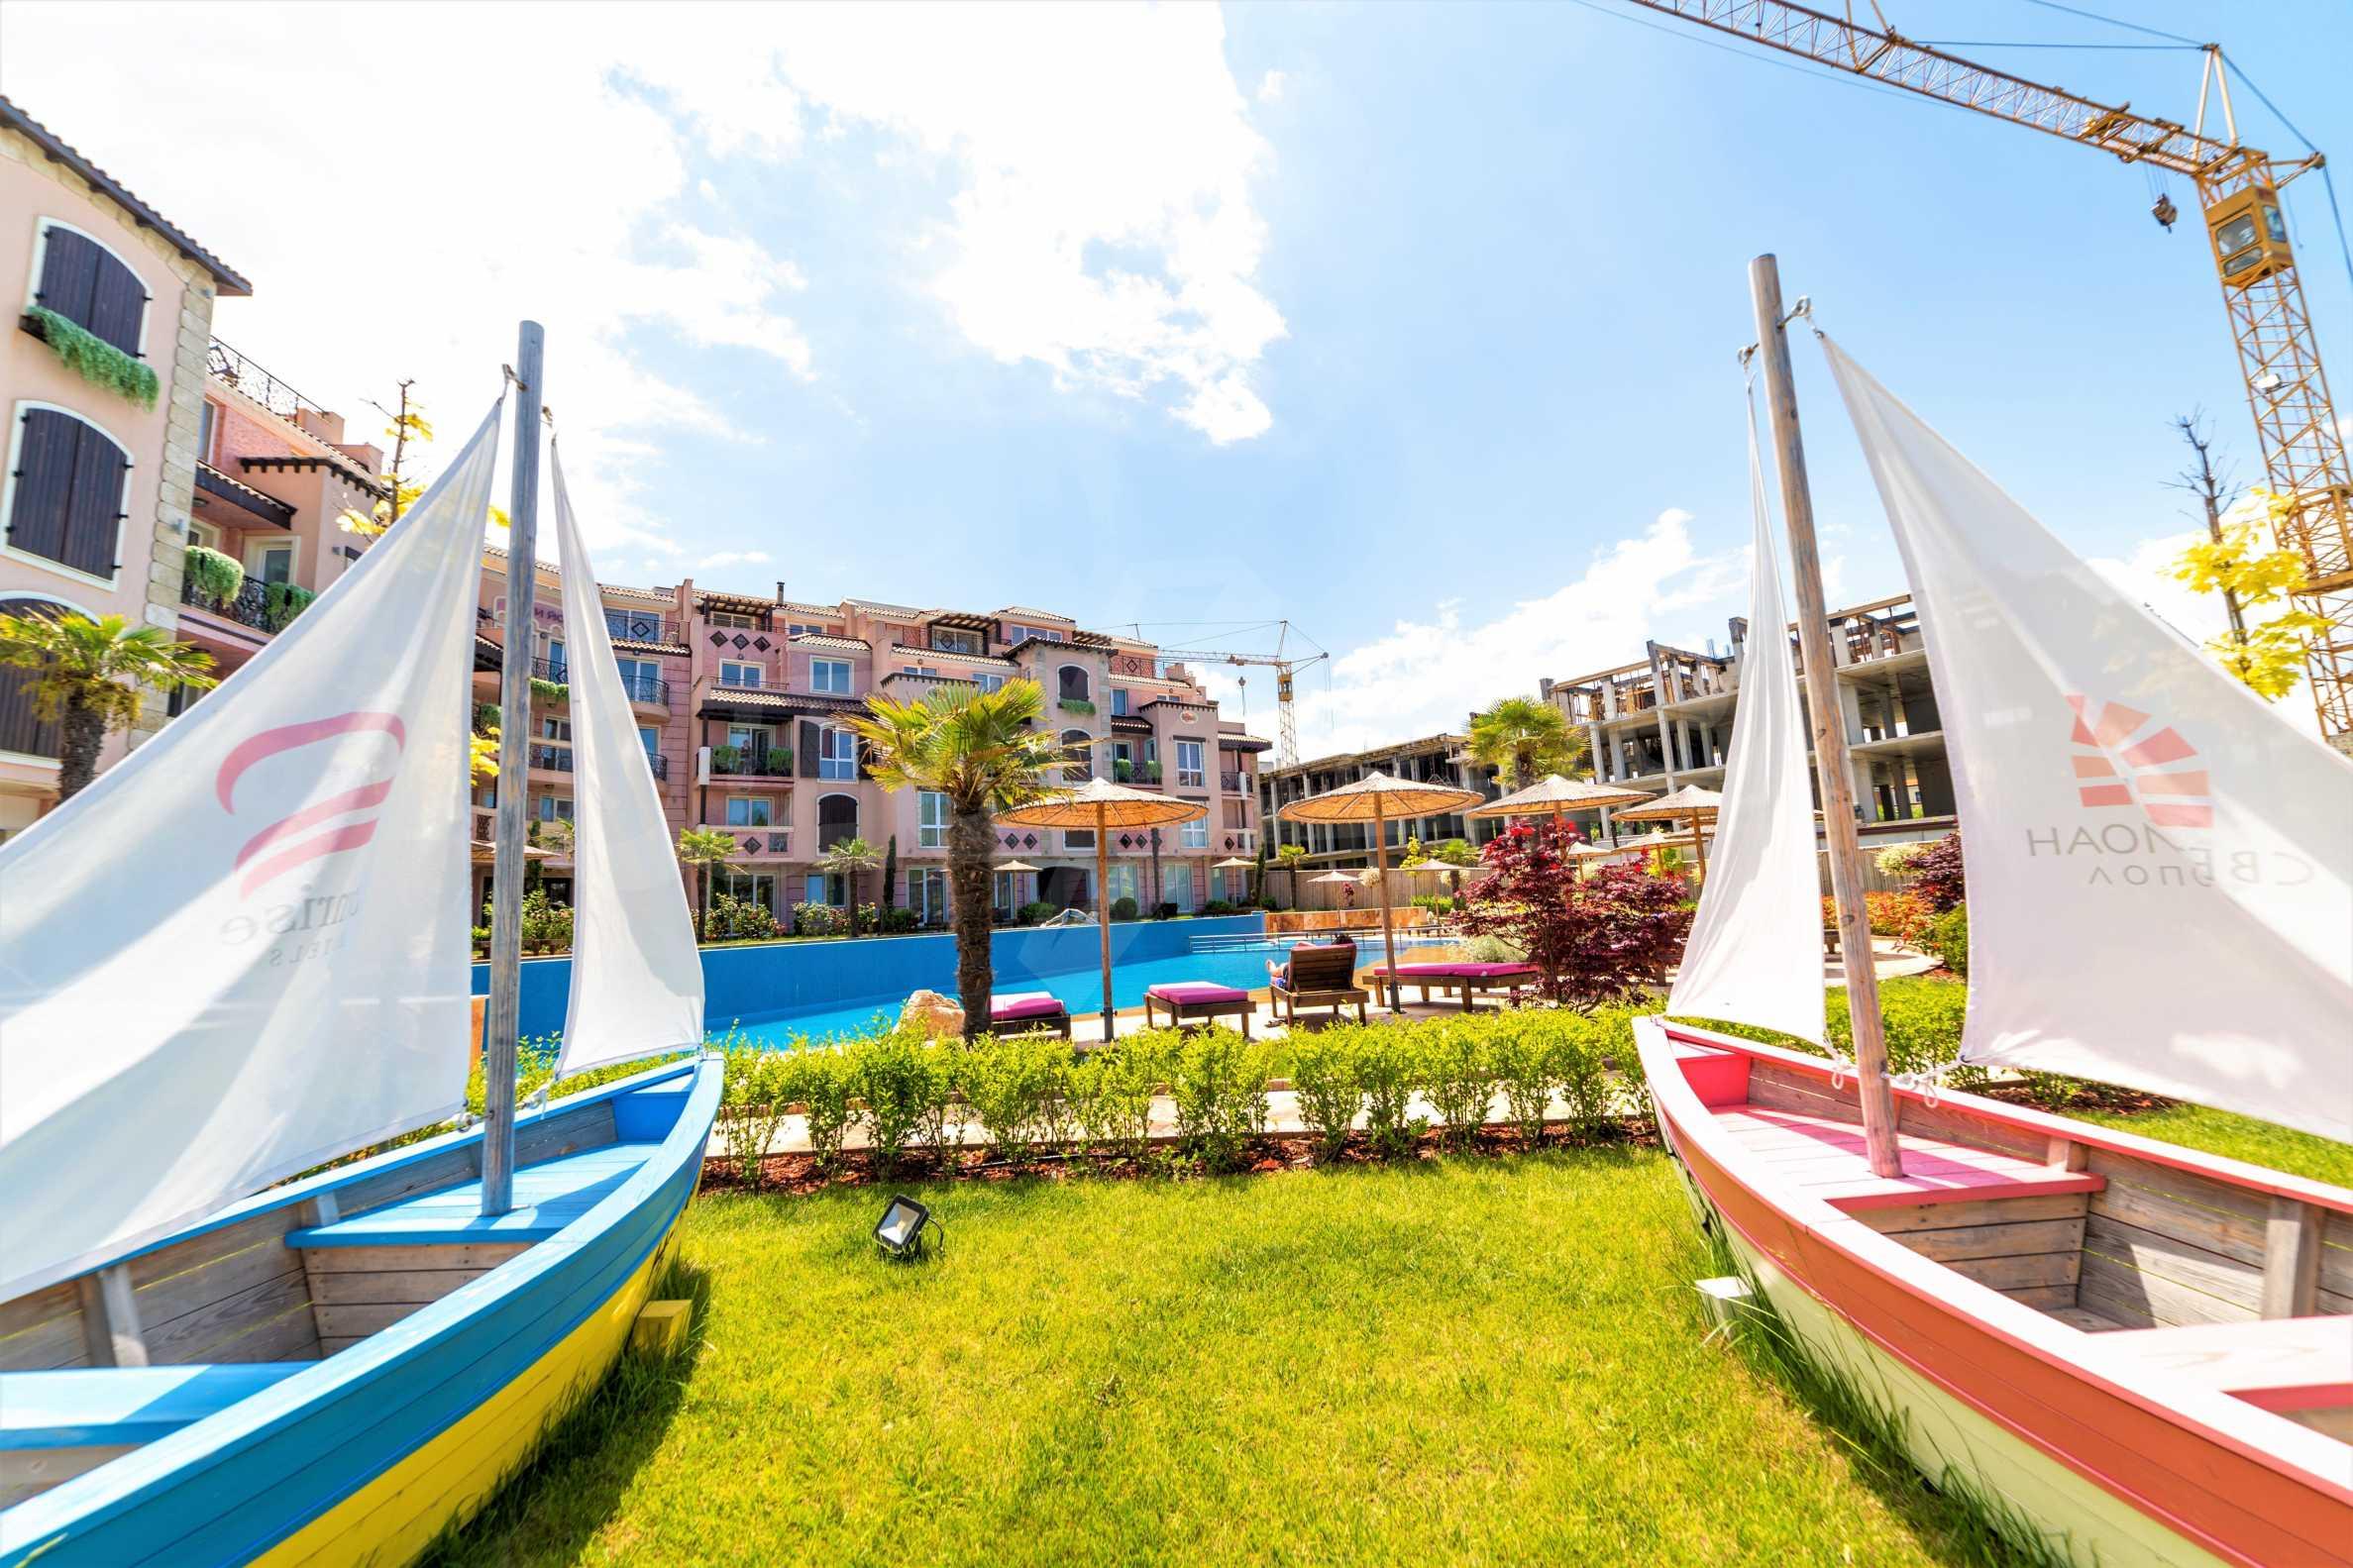 New 1-bedroom apartment in a coastal complex by the Kavatsite Beach (Sozopol) 8